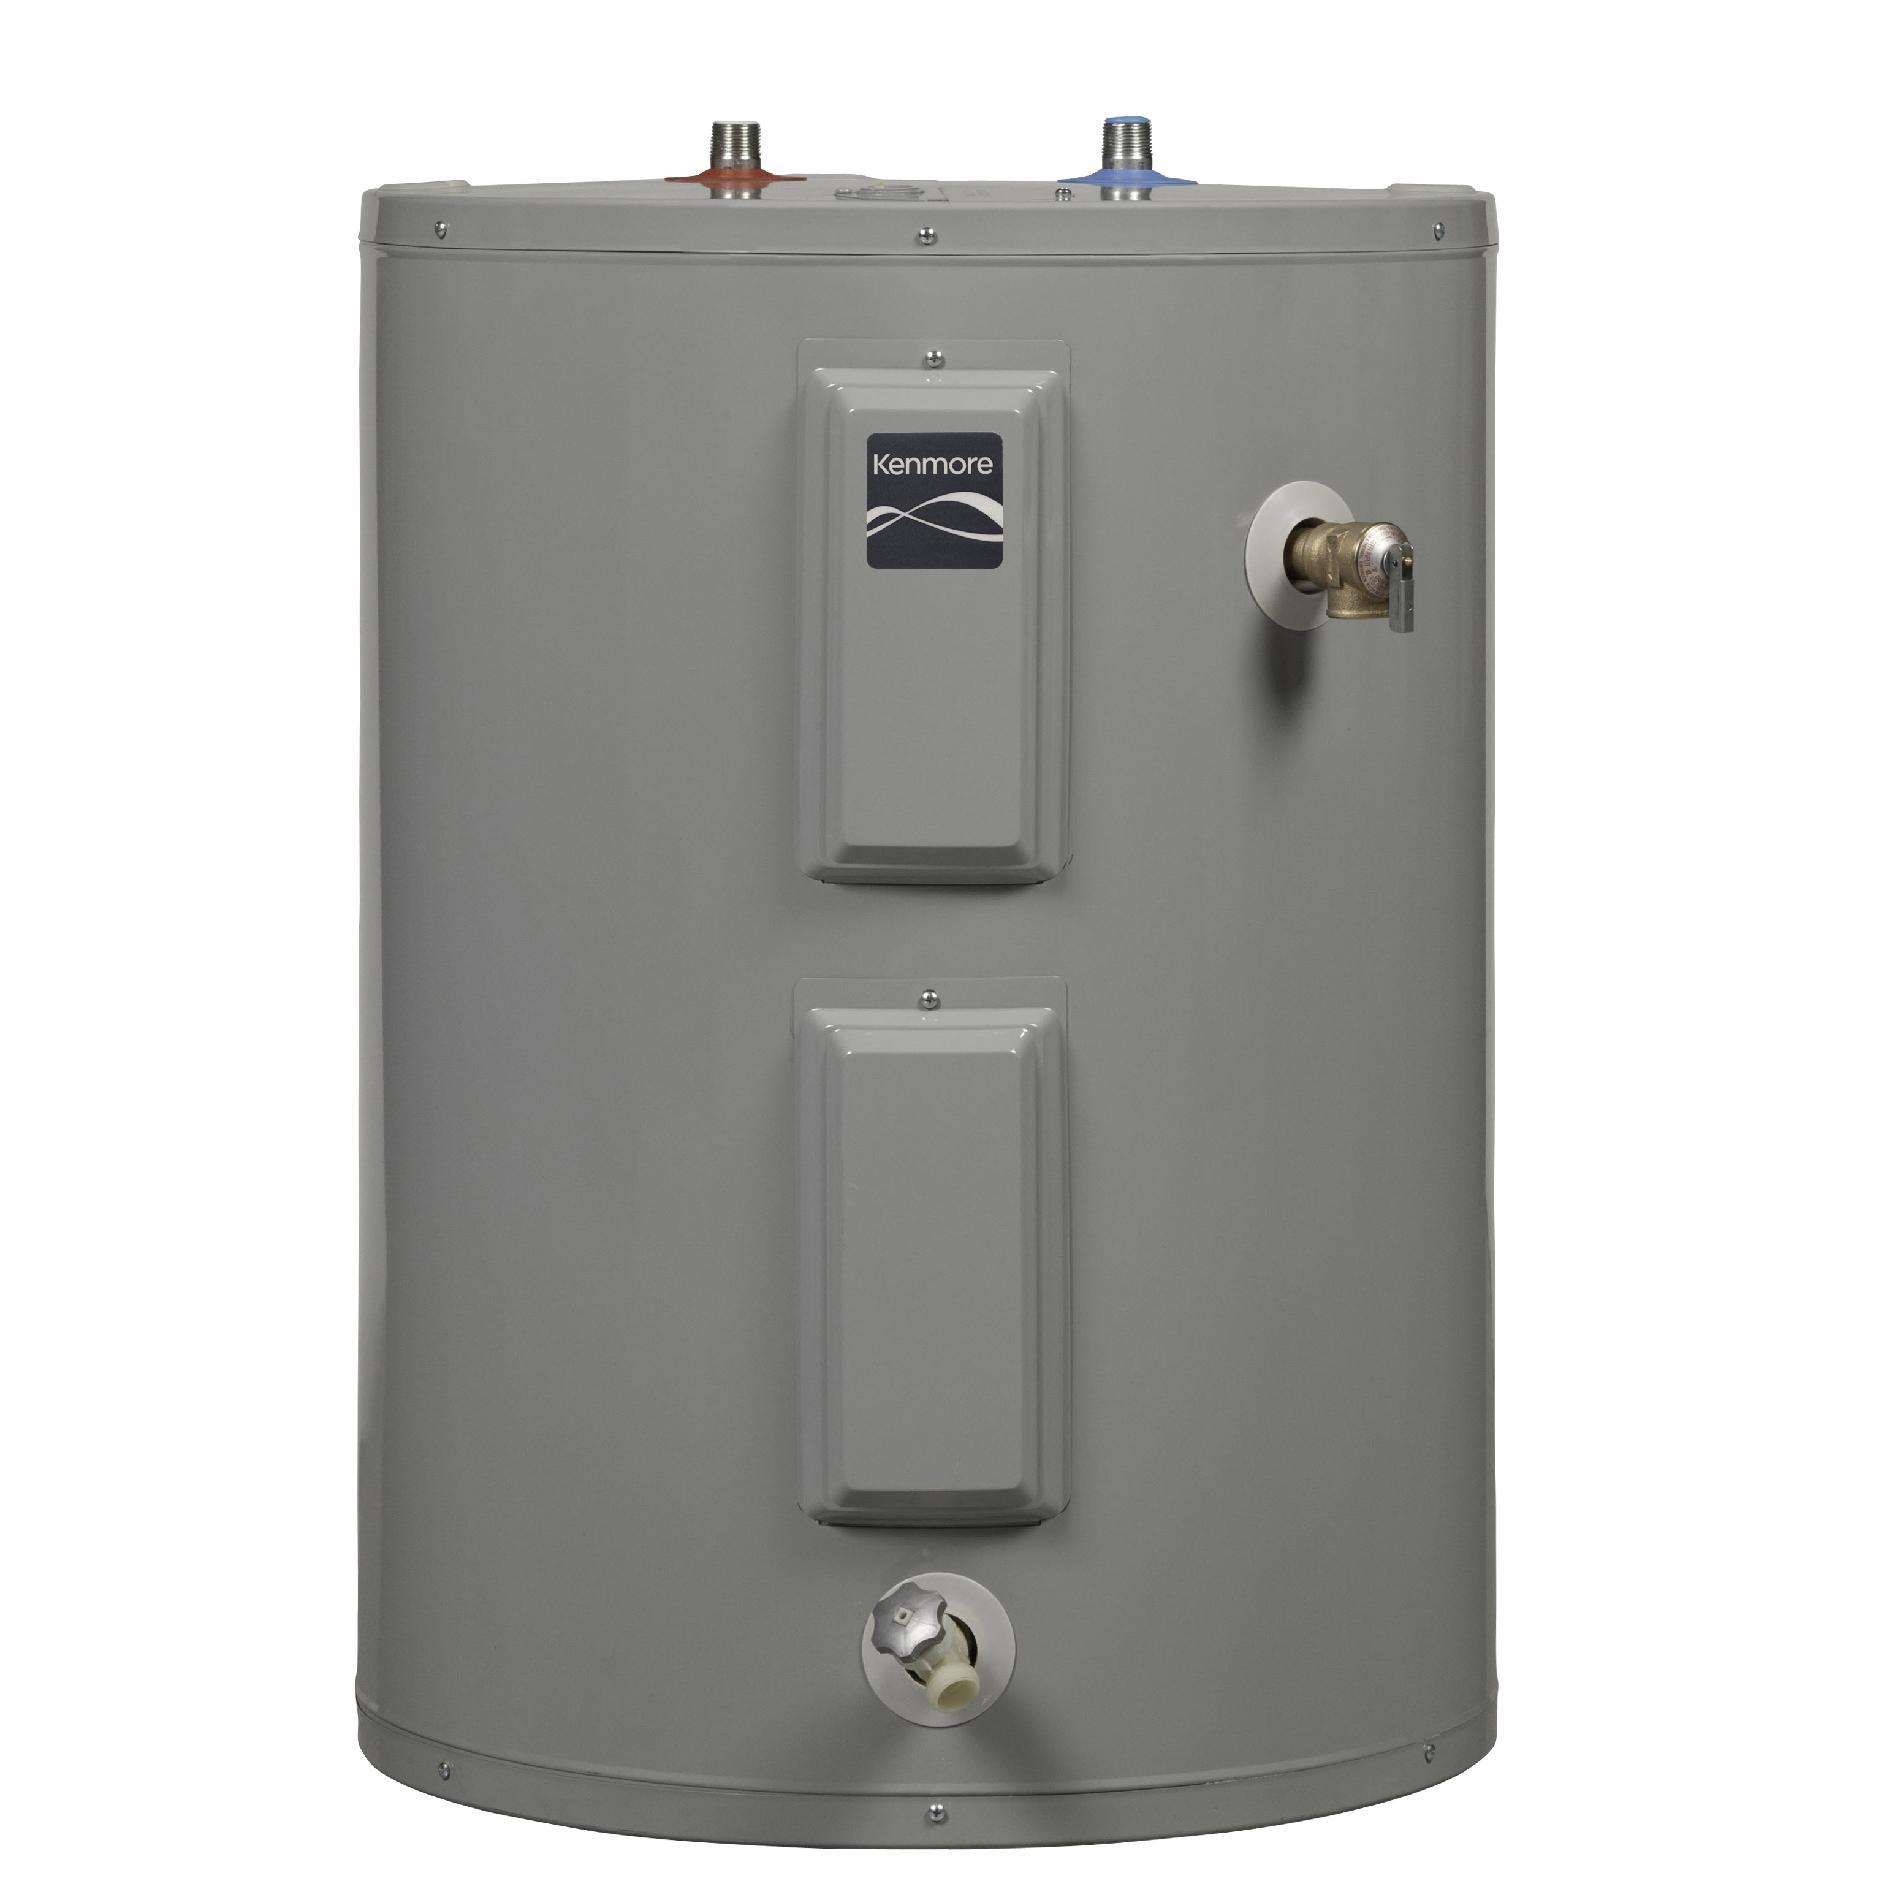 Kenmore Electric Water Heater 30 Gal. 32616